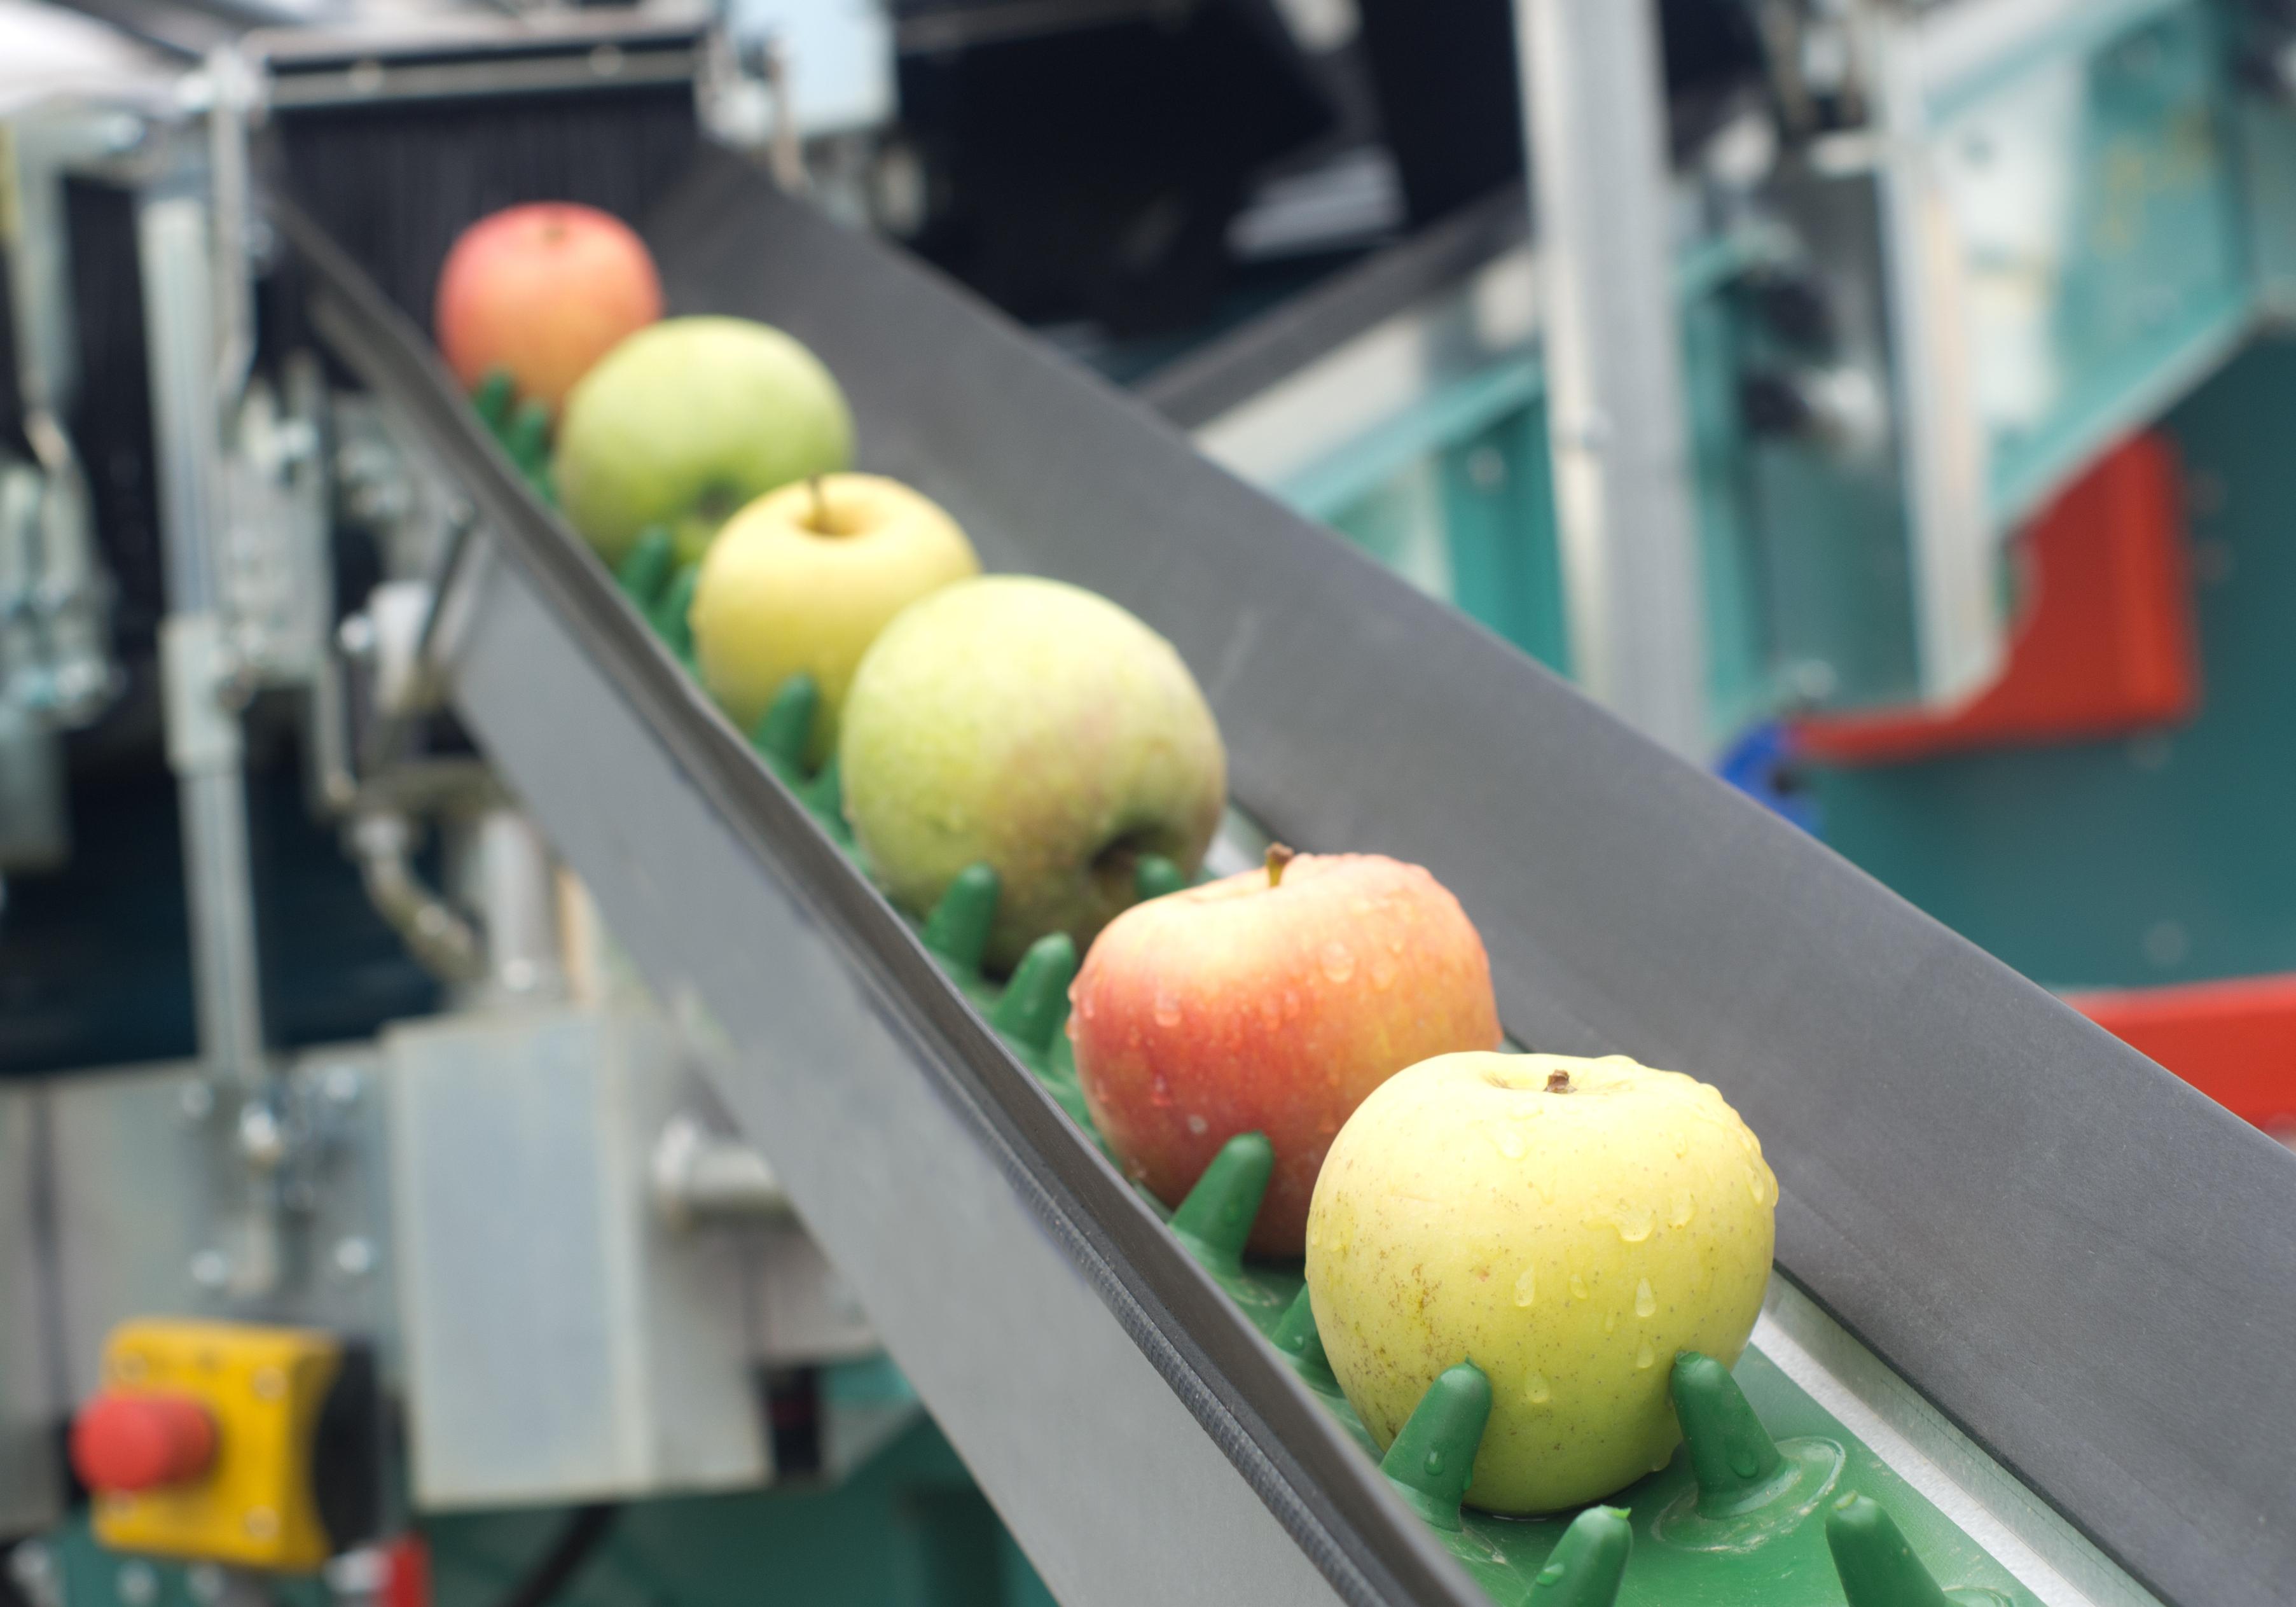 Image of apples on a conveyor belt